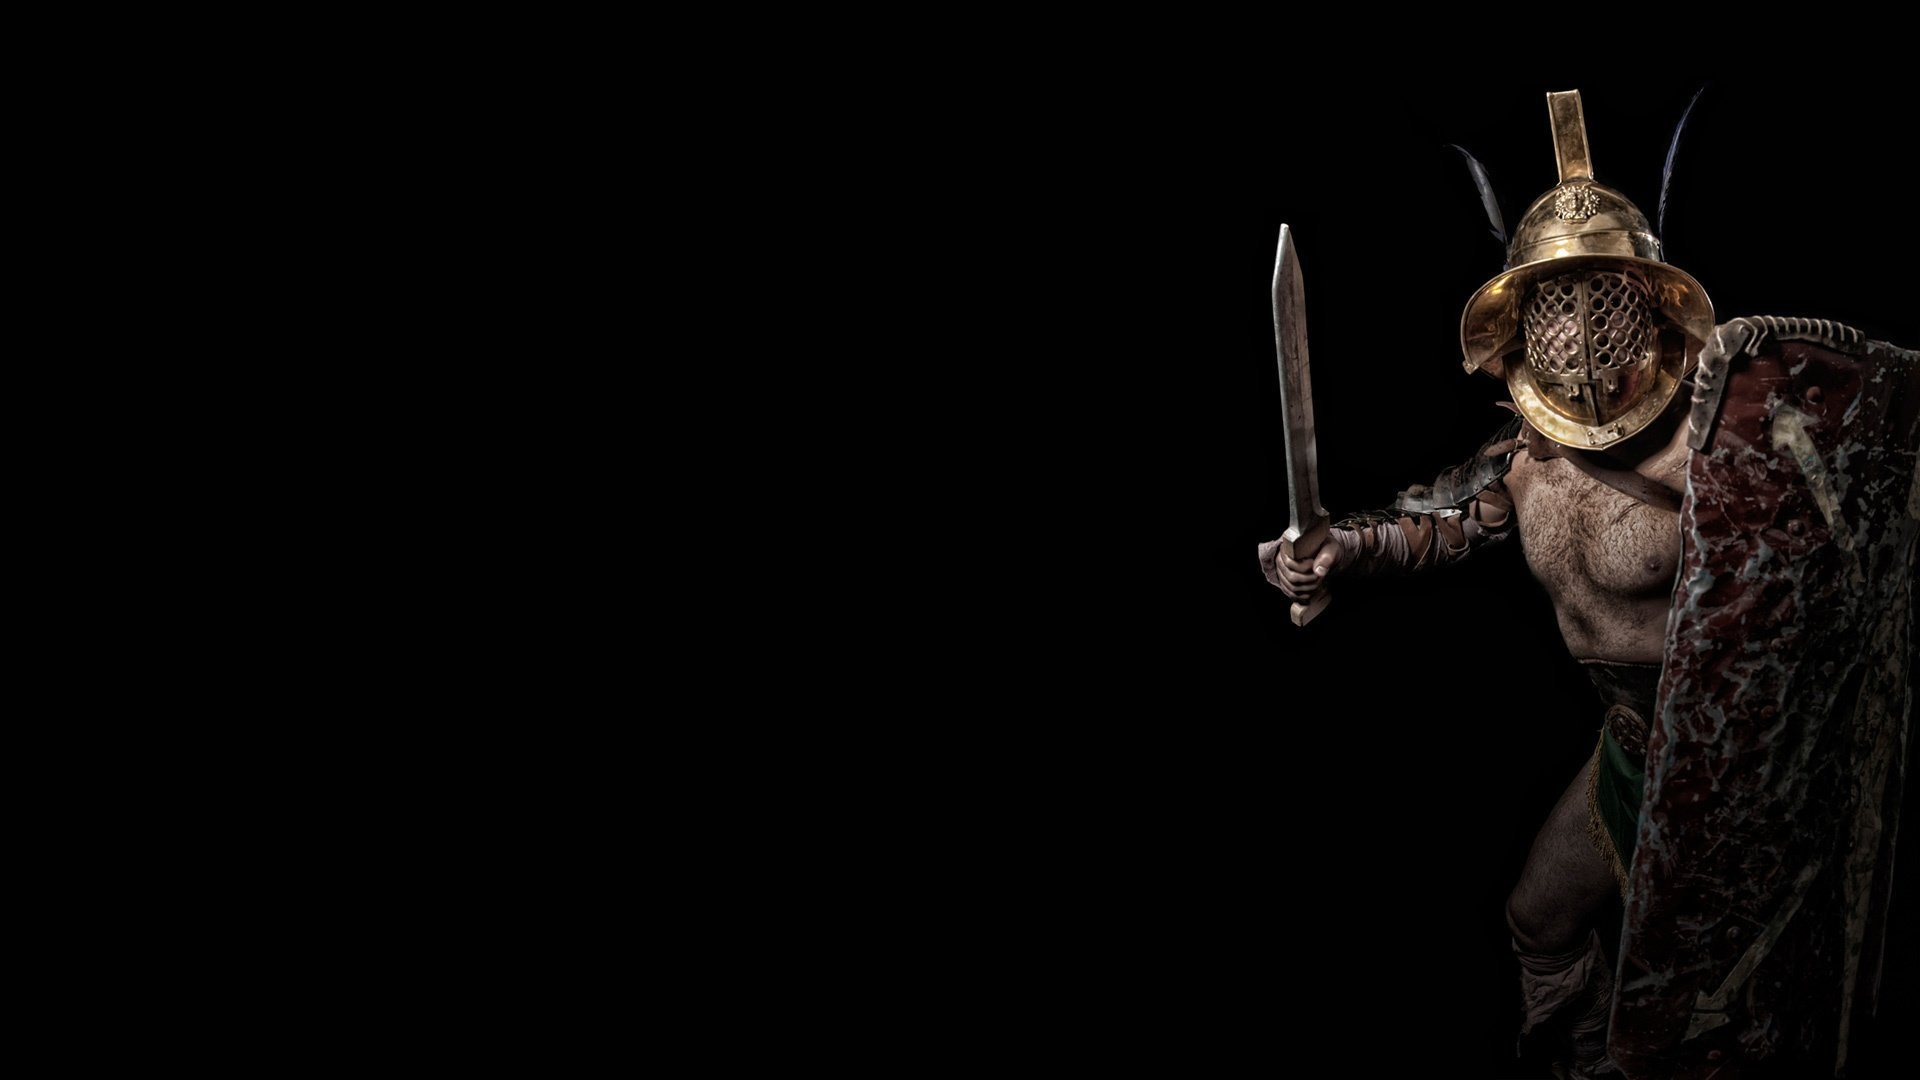 murmillo murmillo gladiator armour helmet shield